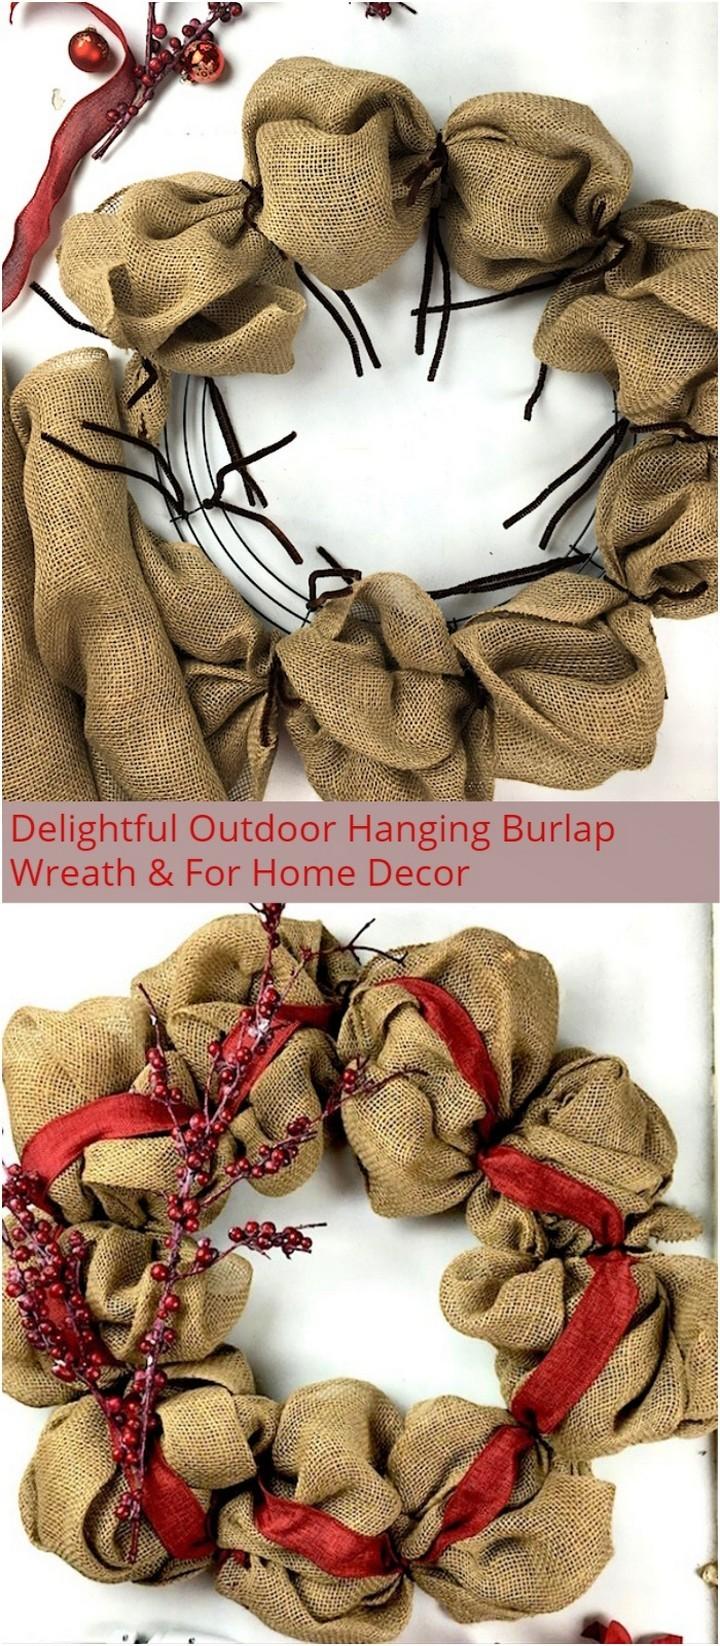 Delightful Outdoor Hanging Burlap Wreath For Home Decor